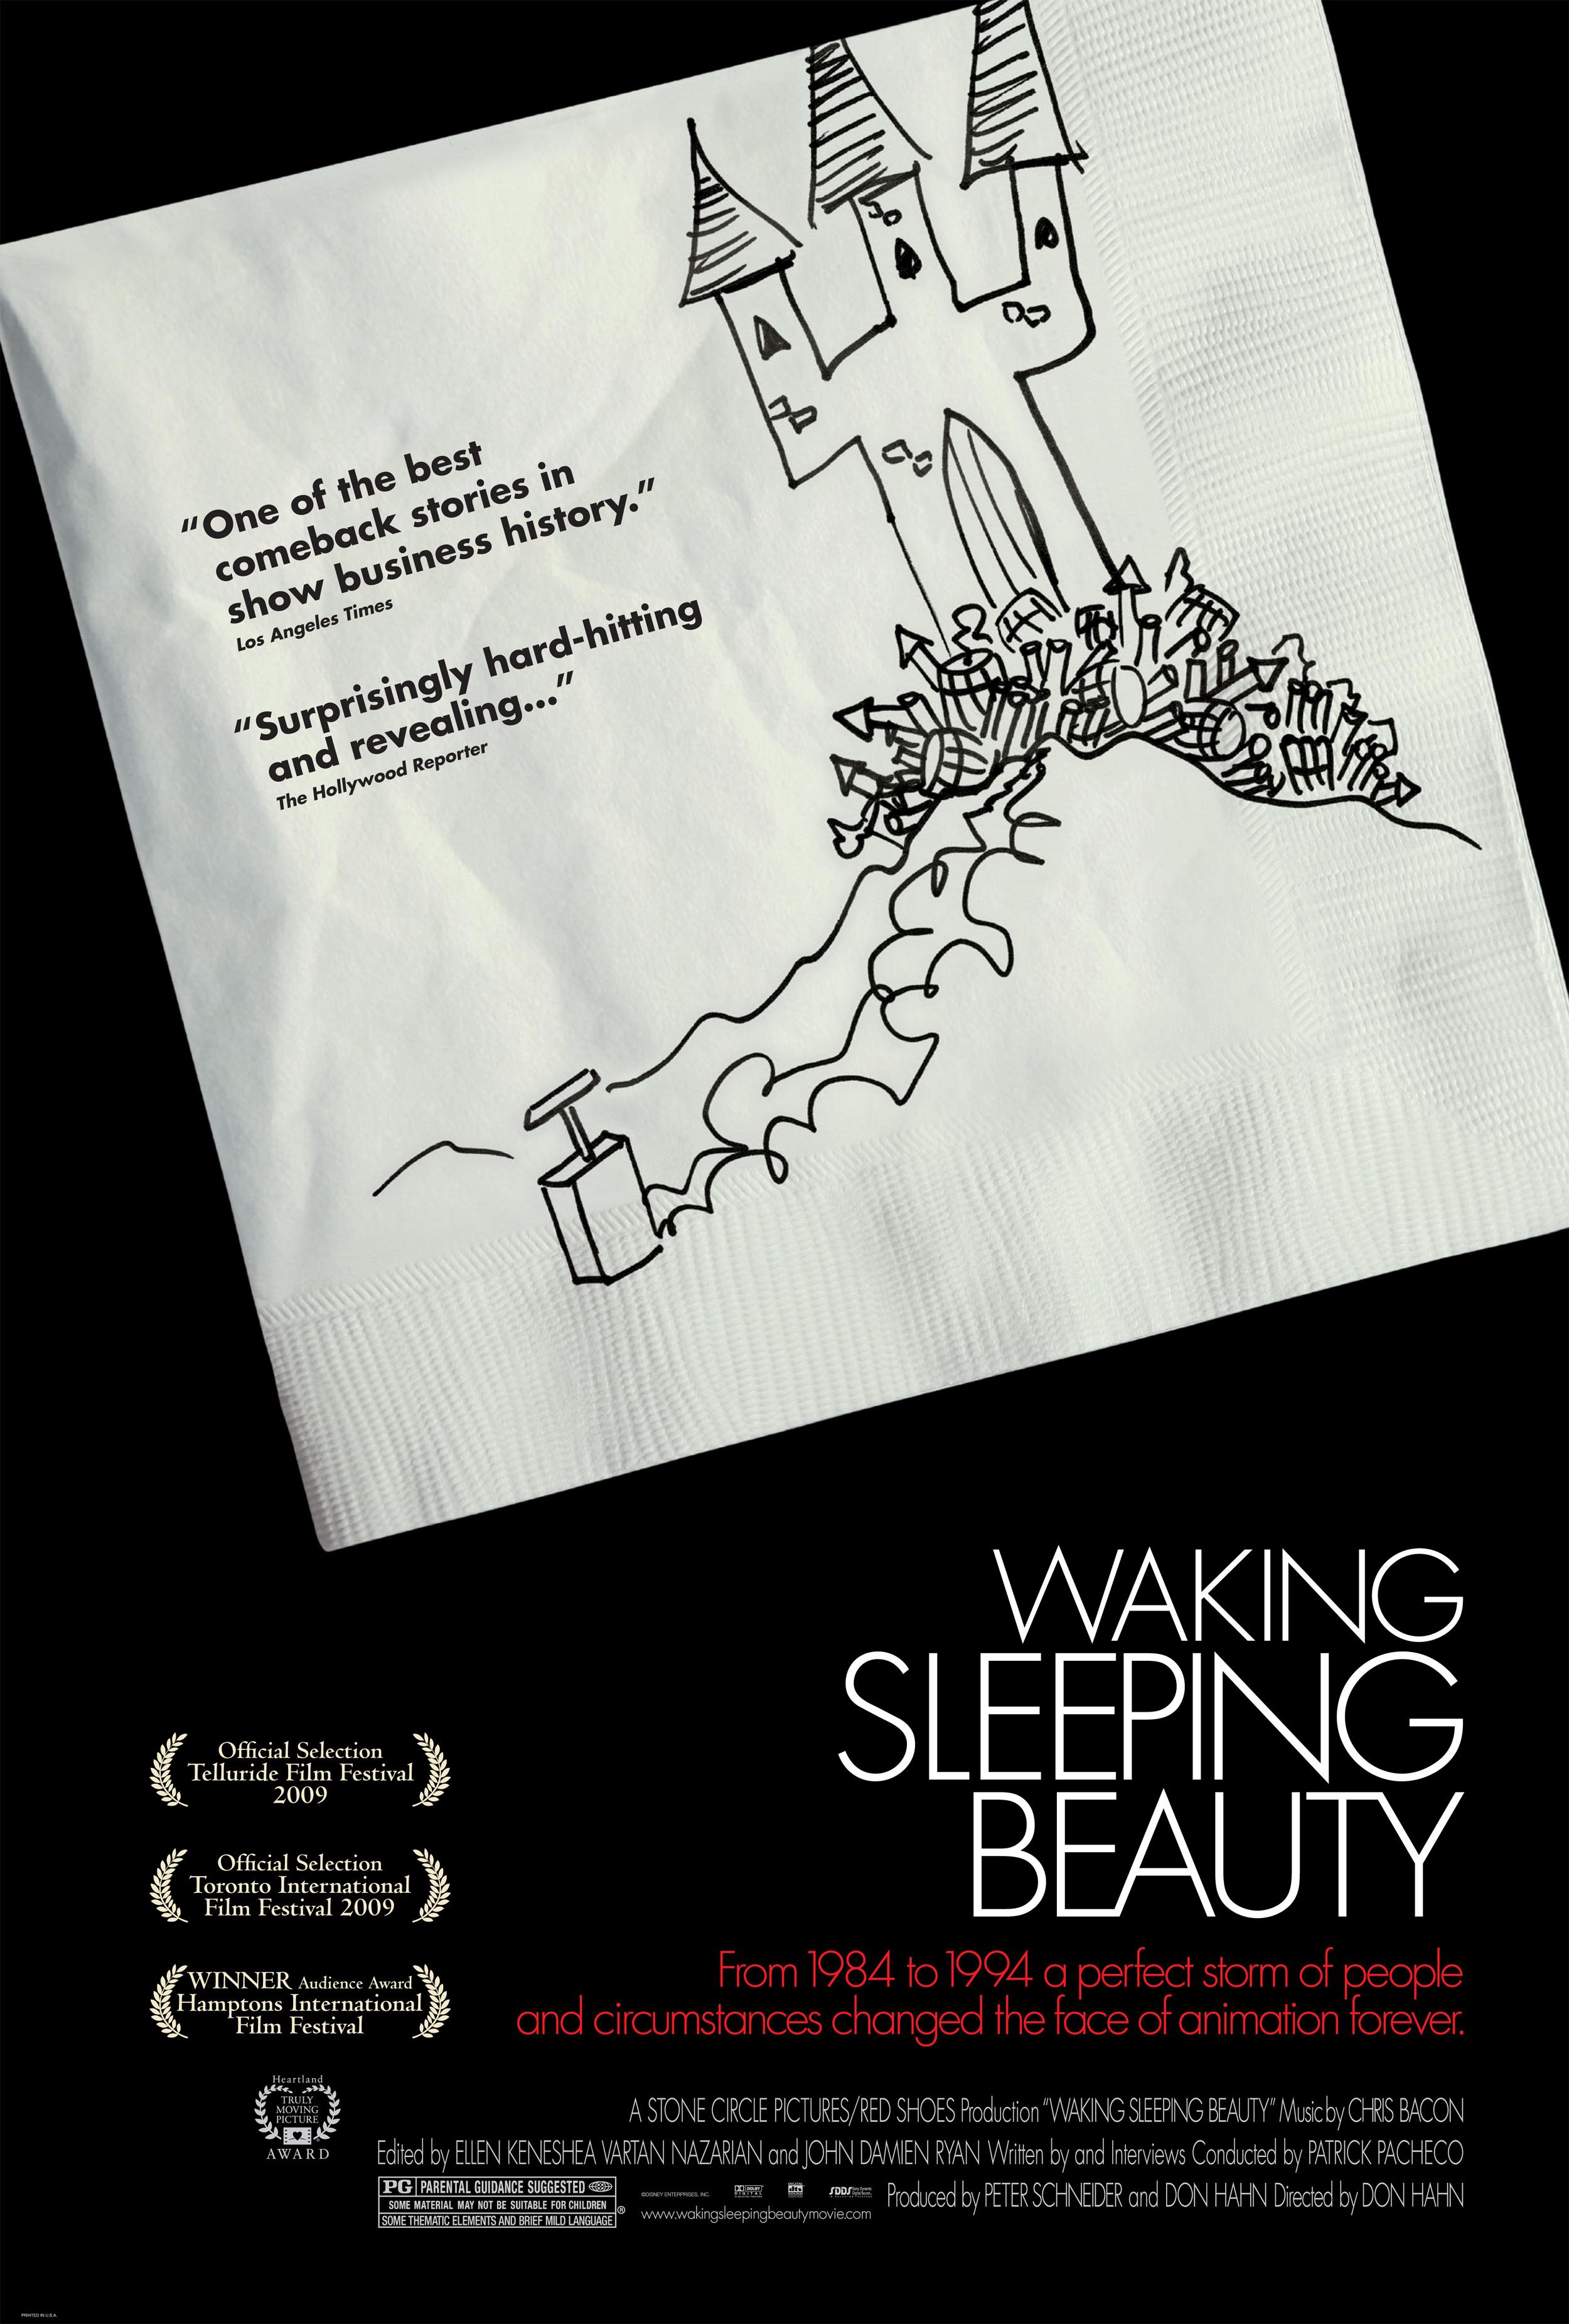 Waking sleeping beauty movie to download full: jinurock.